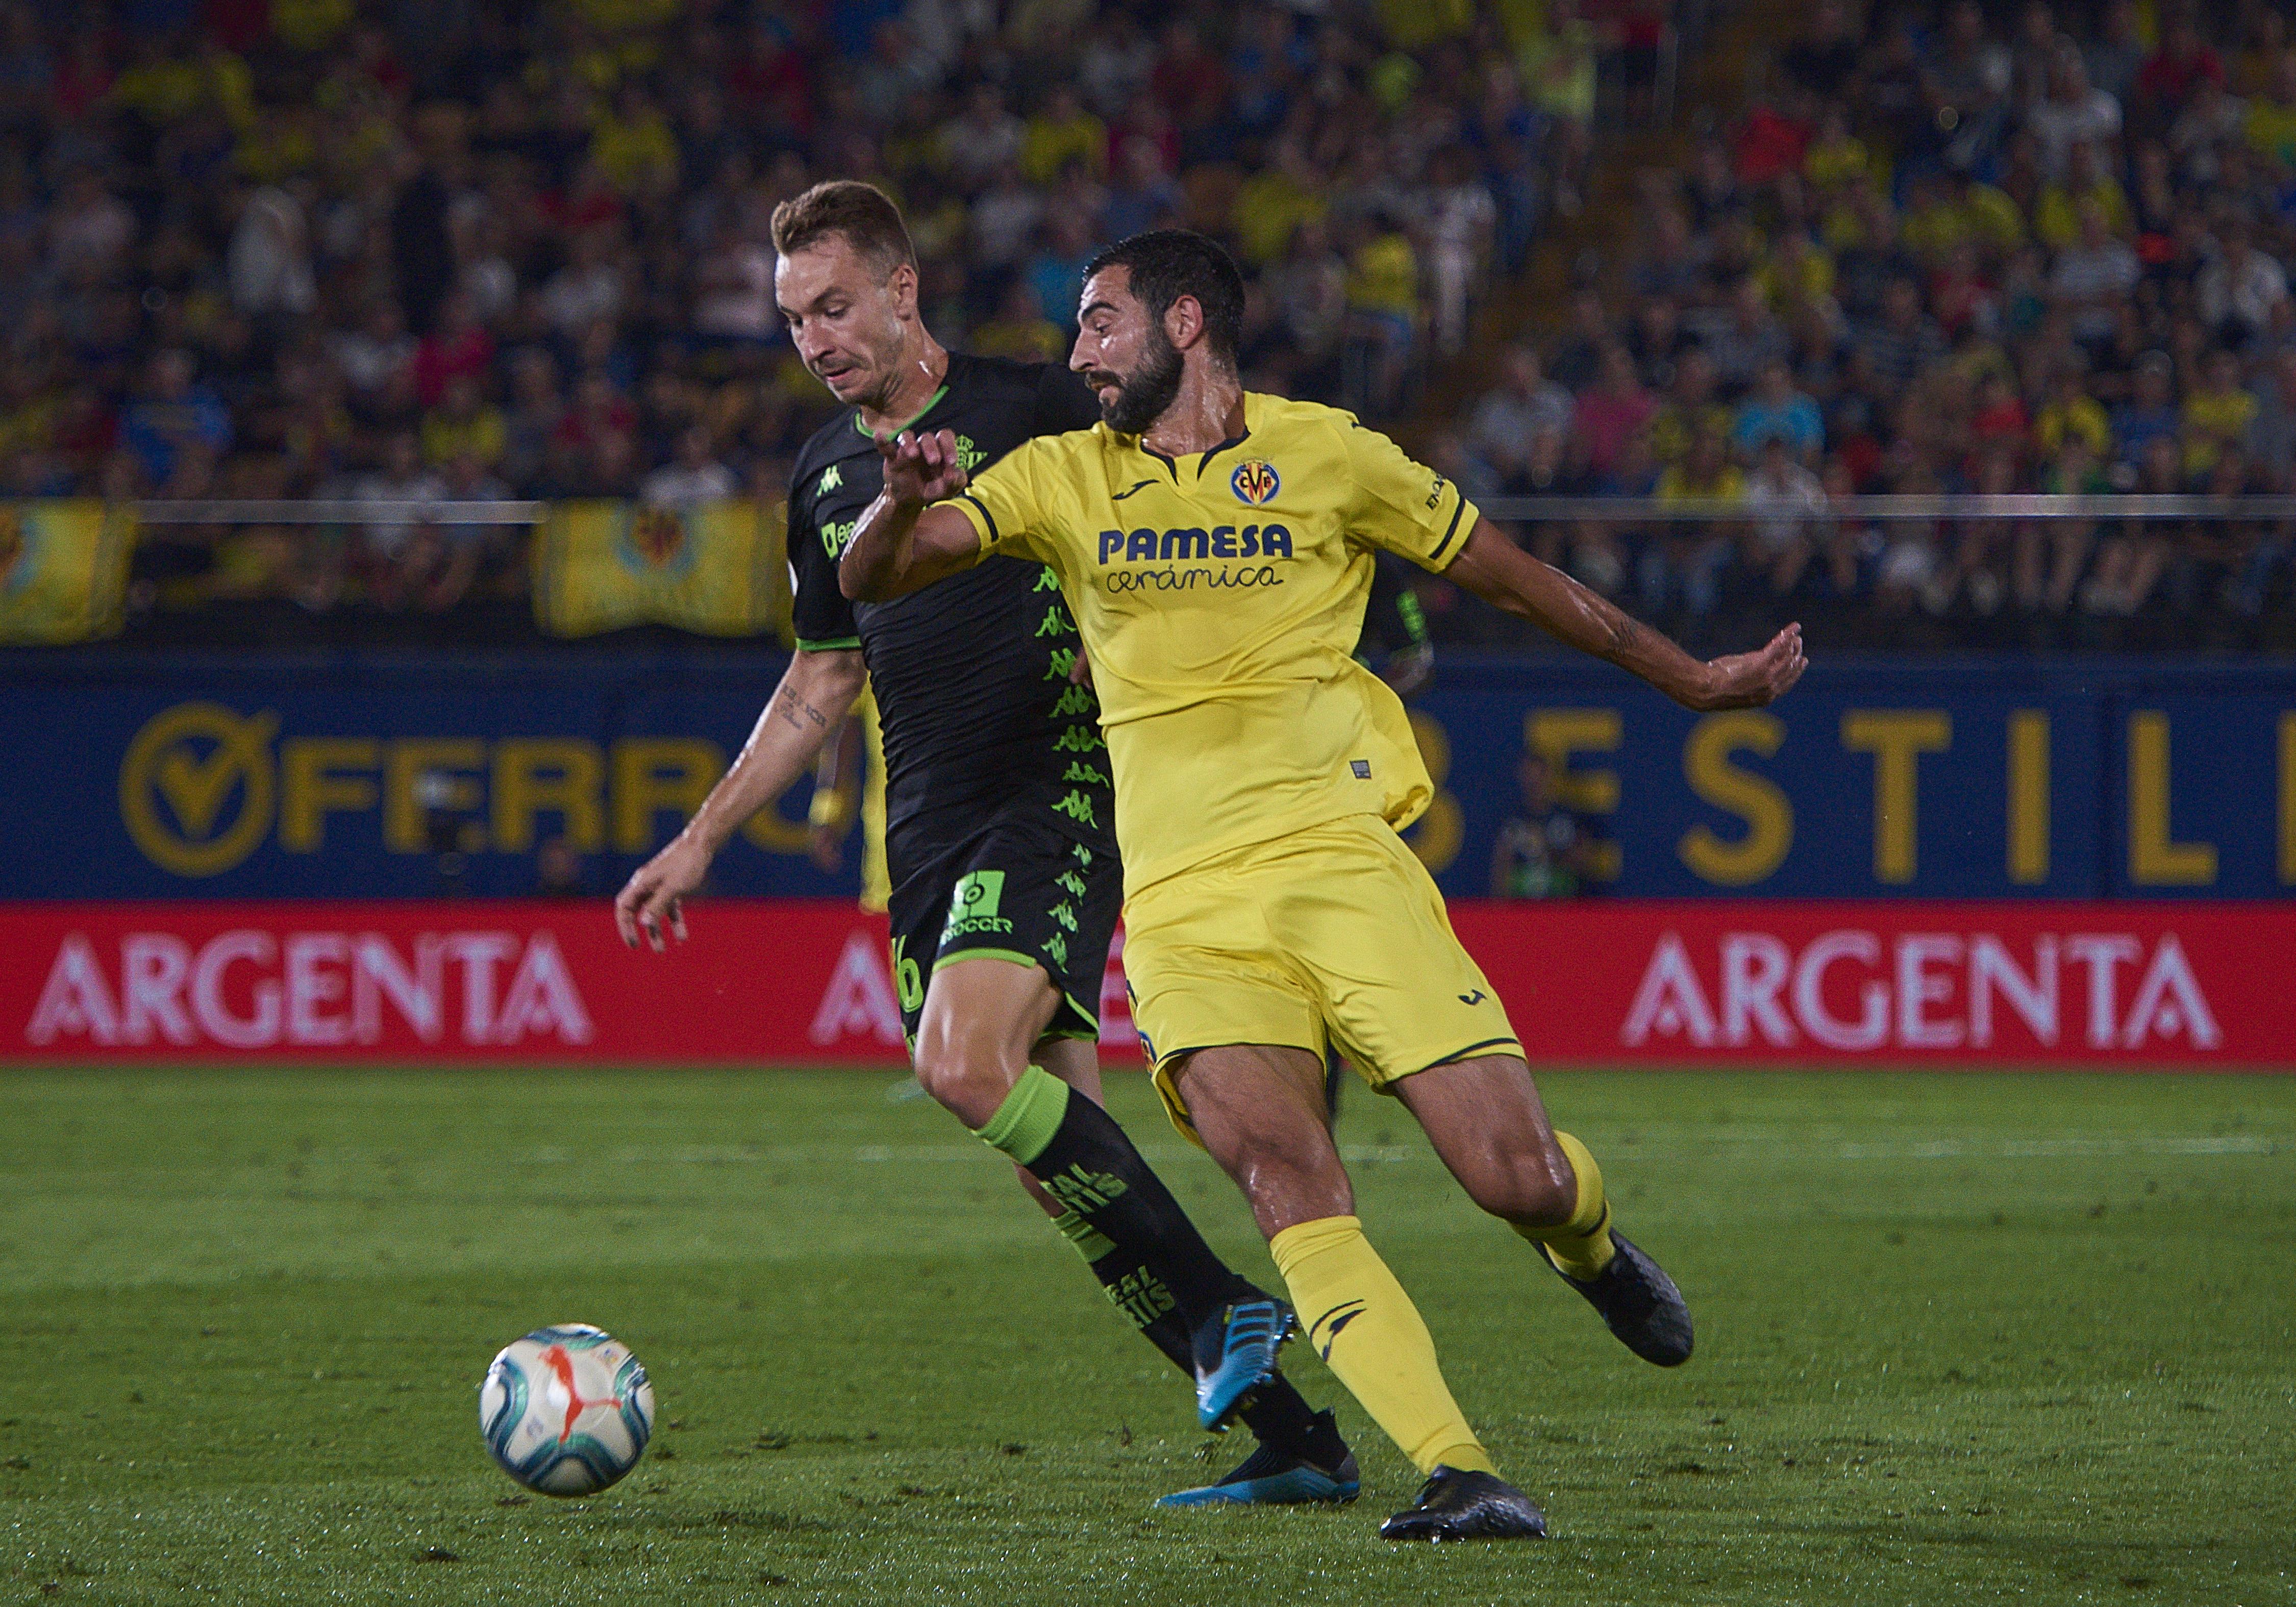 SOCCER: SEP 27 La Liga - Real Betis Balompie at Villarreal CF